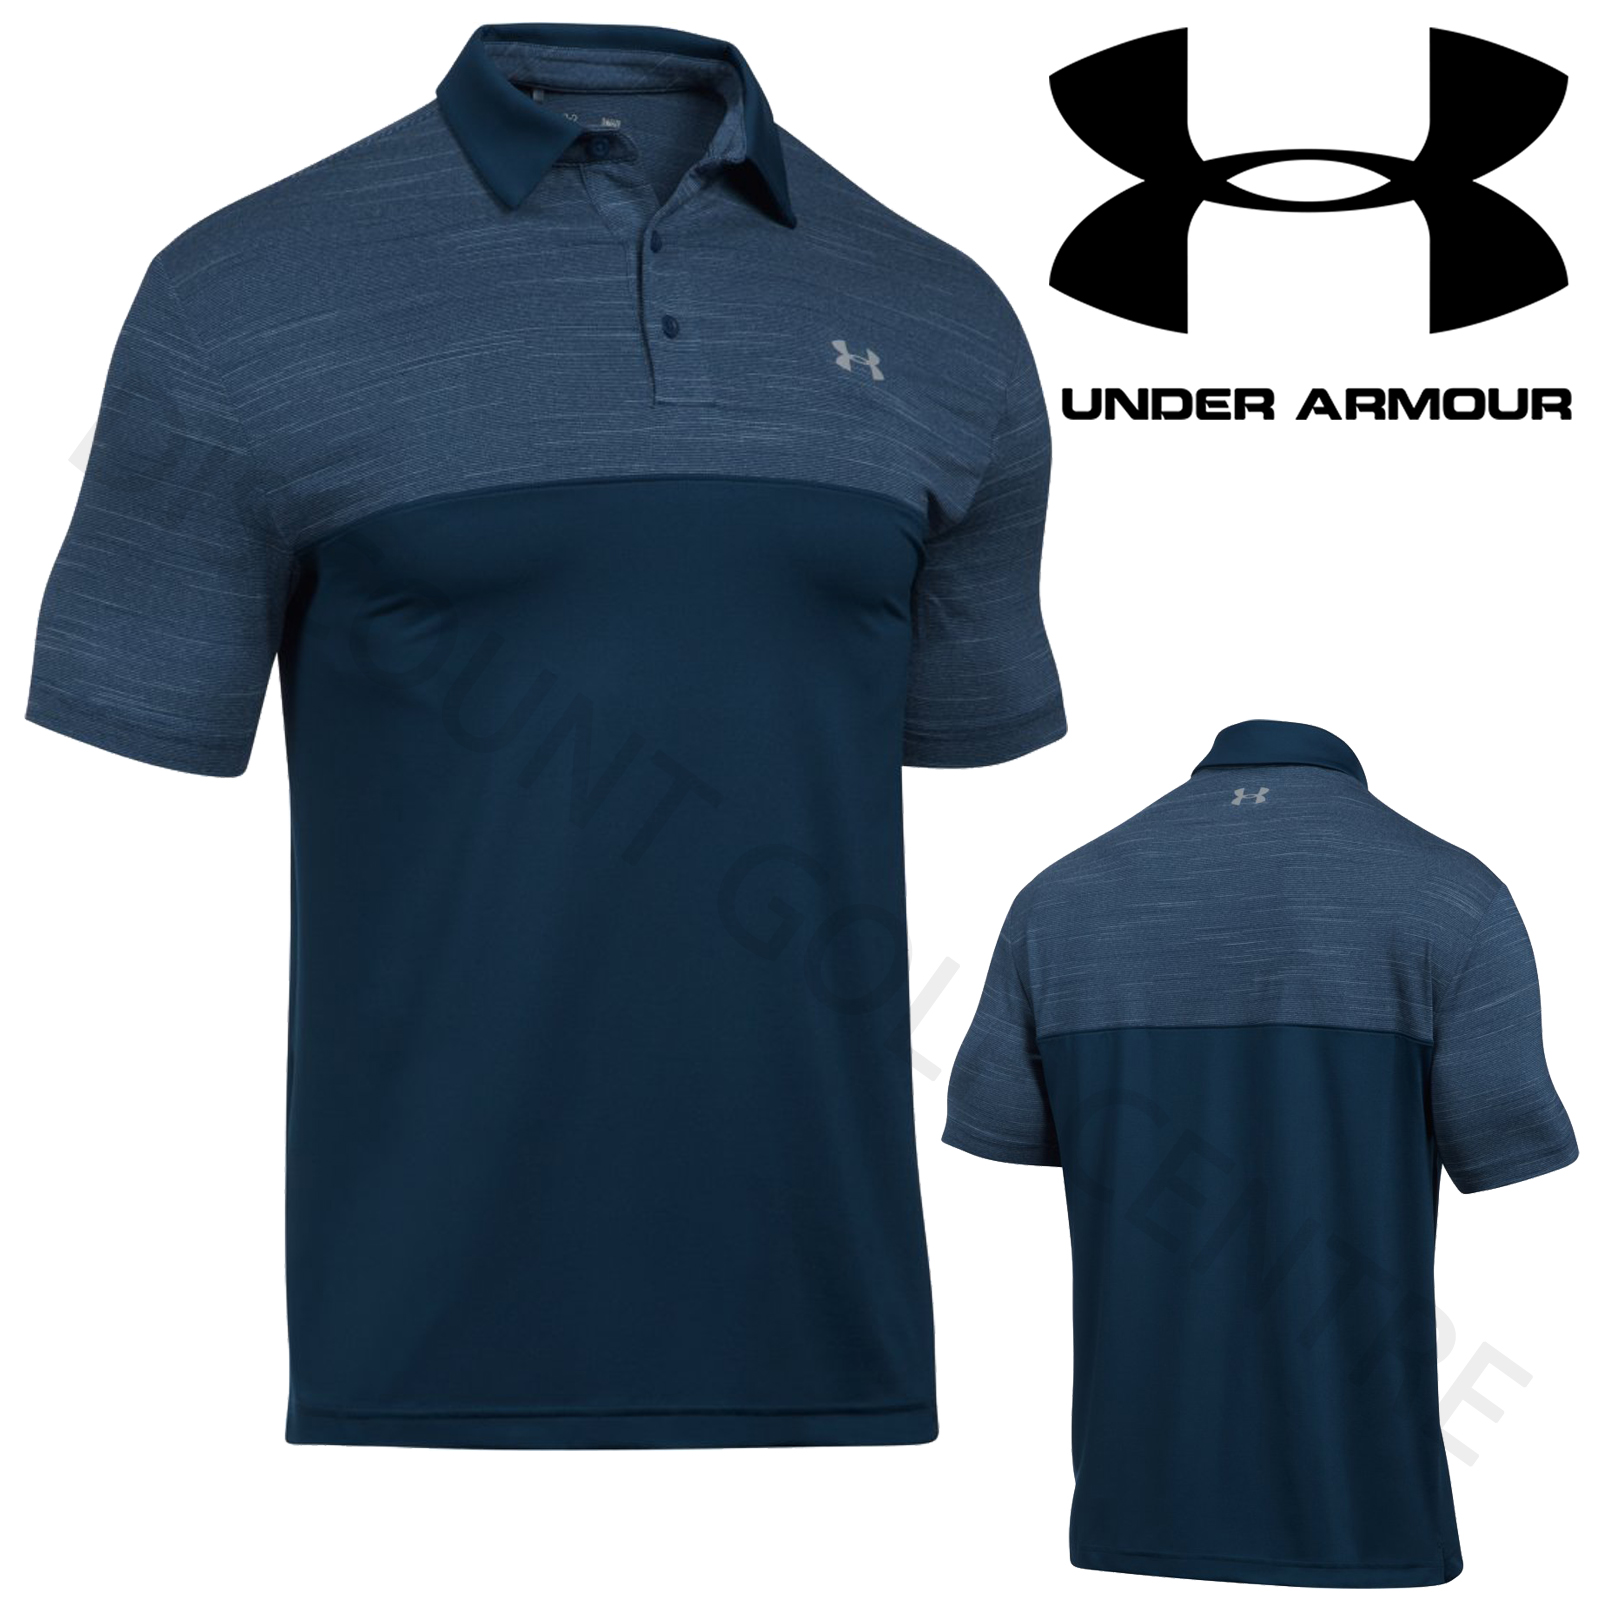 Under armour 2017 ua mens playoff blocked golf heatgear for Under armor polo shirts